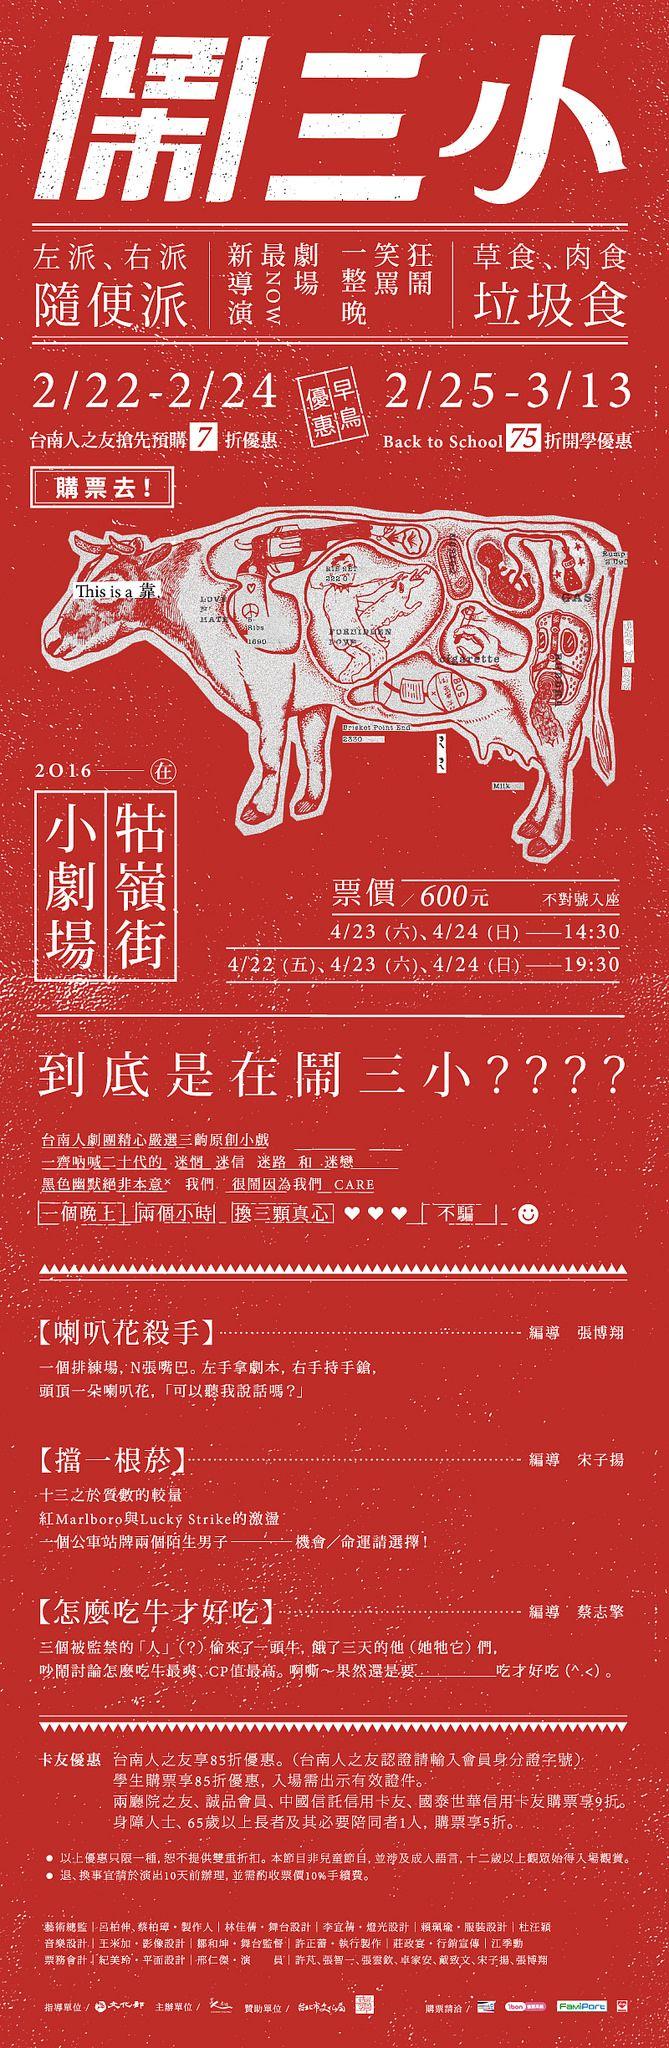 https://flic.kr/p/DVgwzy   《鬧三小》台南人劇團